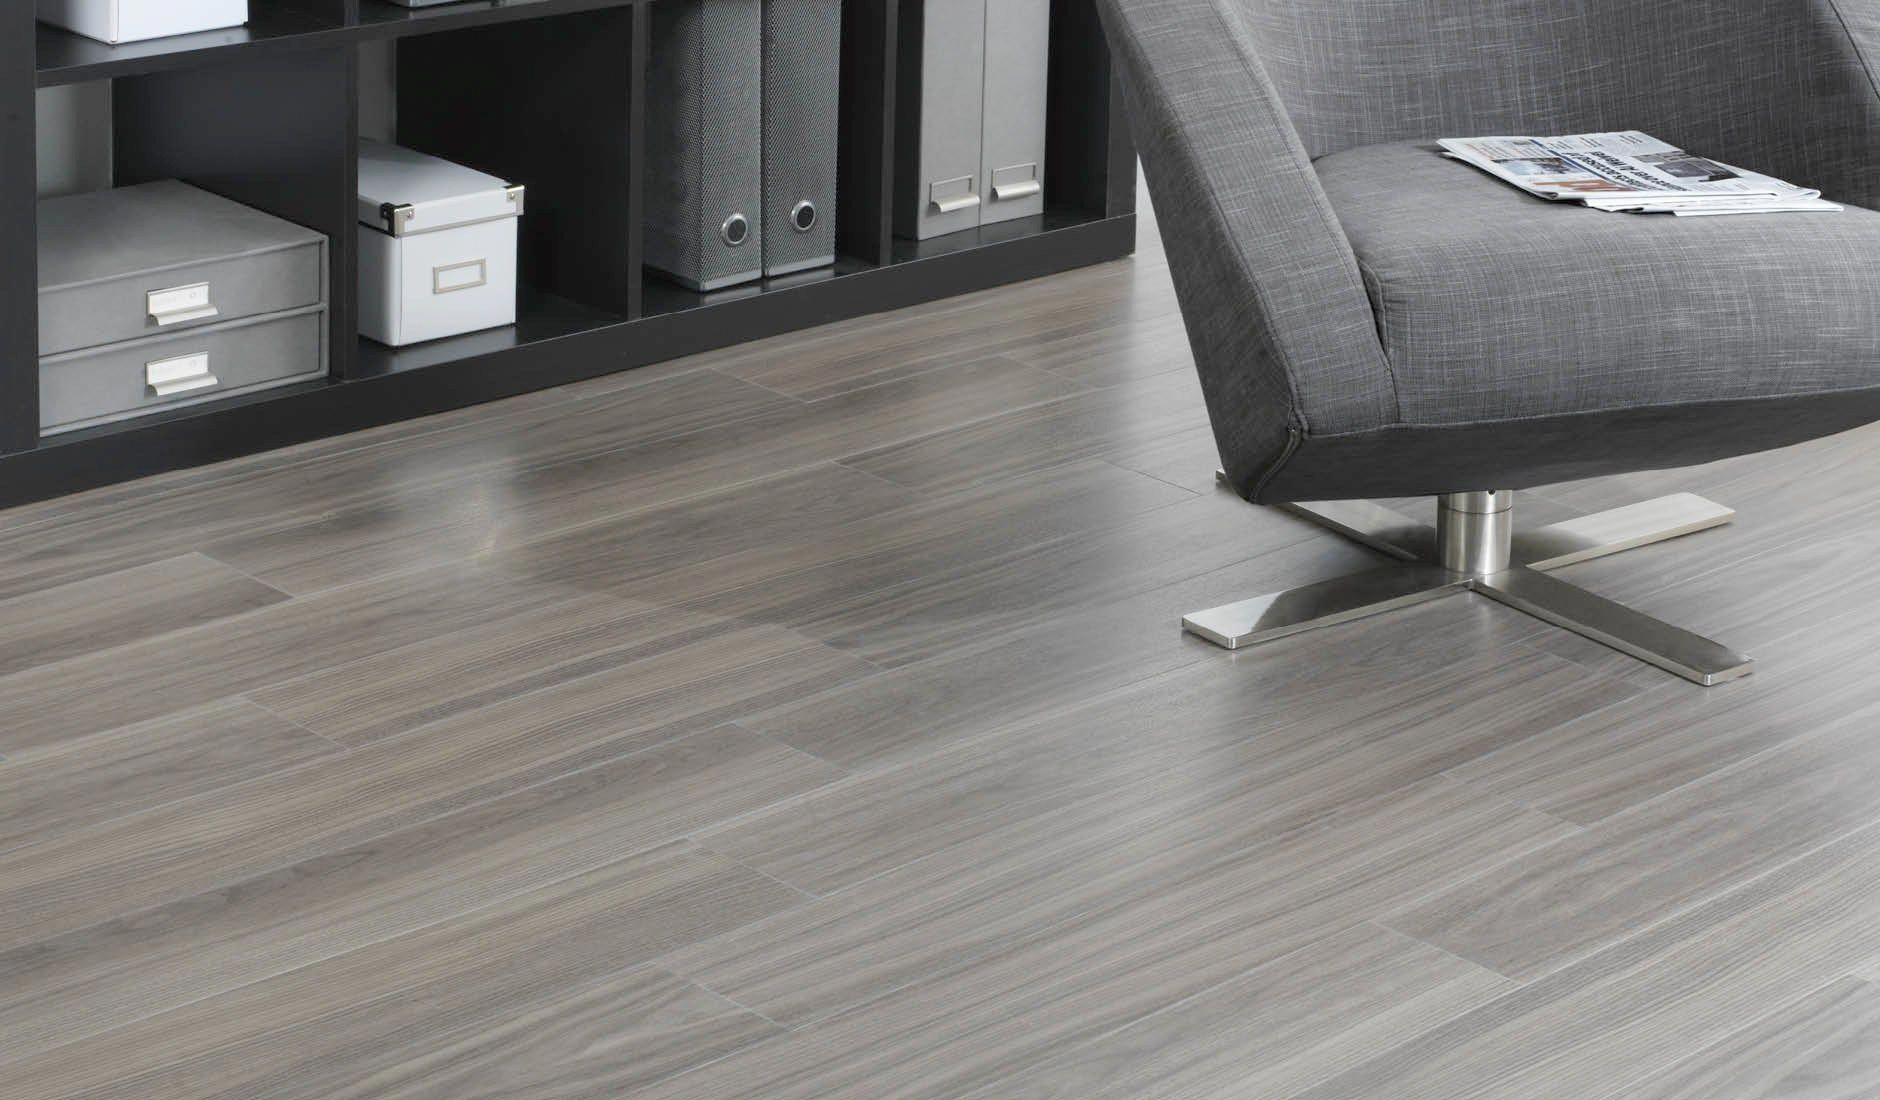 Carpet Tiles Vs Laminate Flooring In Office Laminateflooring Carpettiles Flooring Office Carpetsluxur House Furniture Design Flooring Cleaning Wood Floors